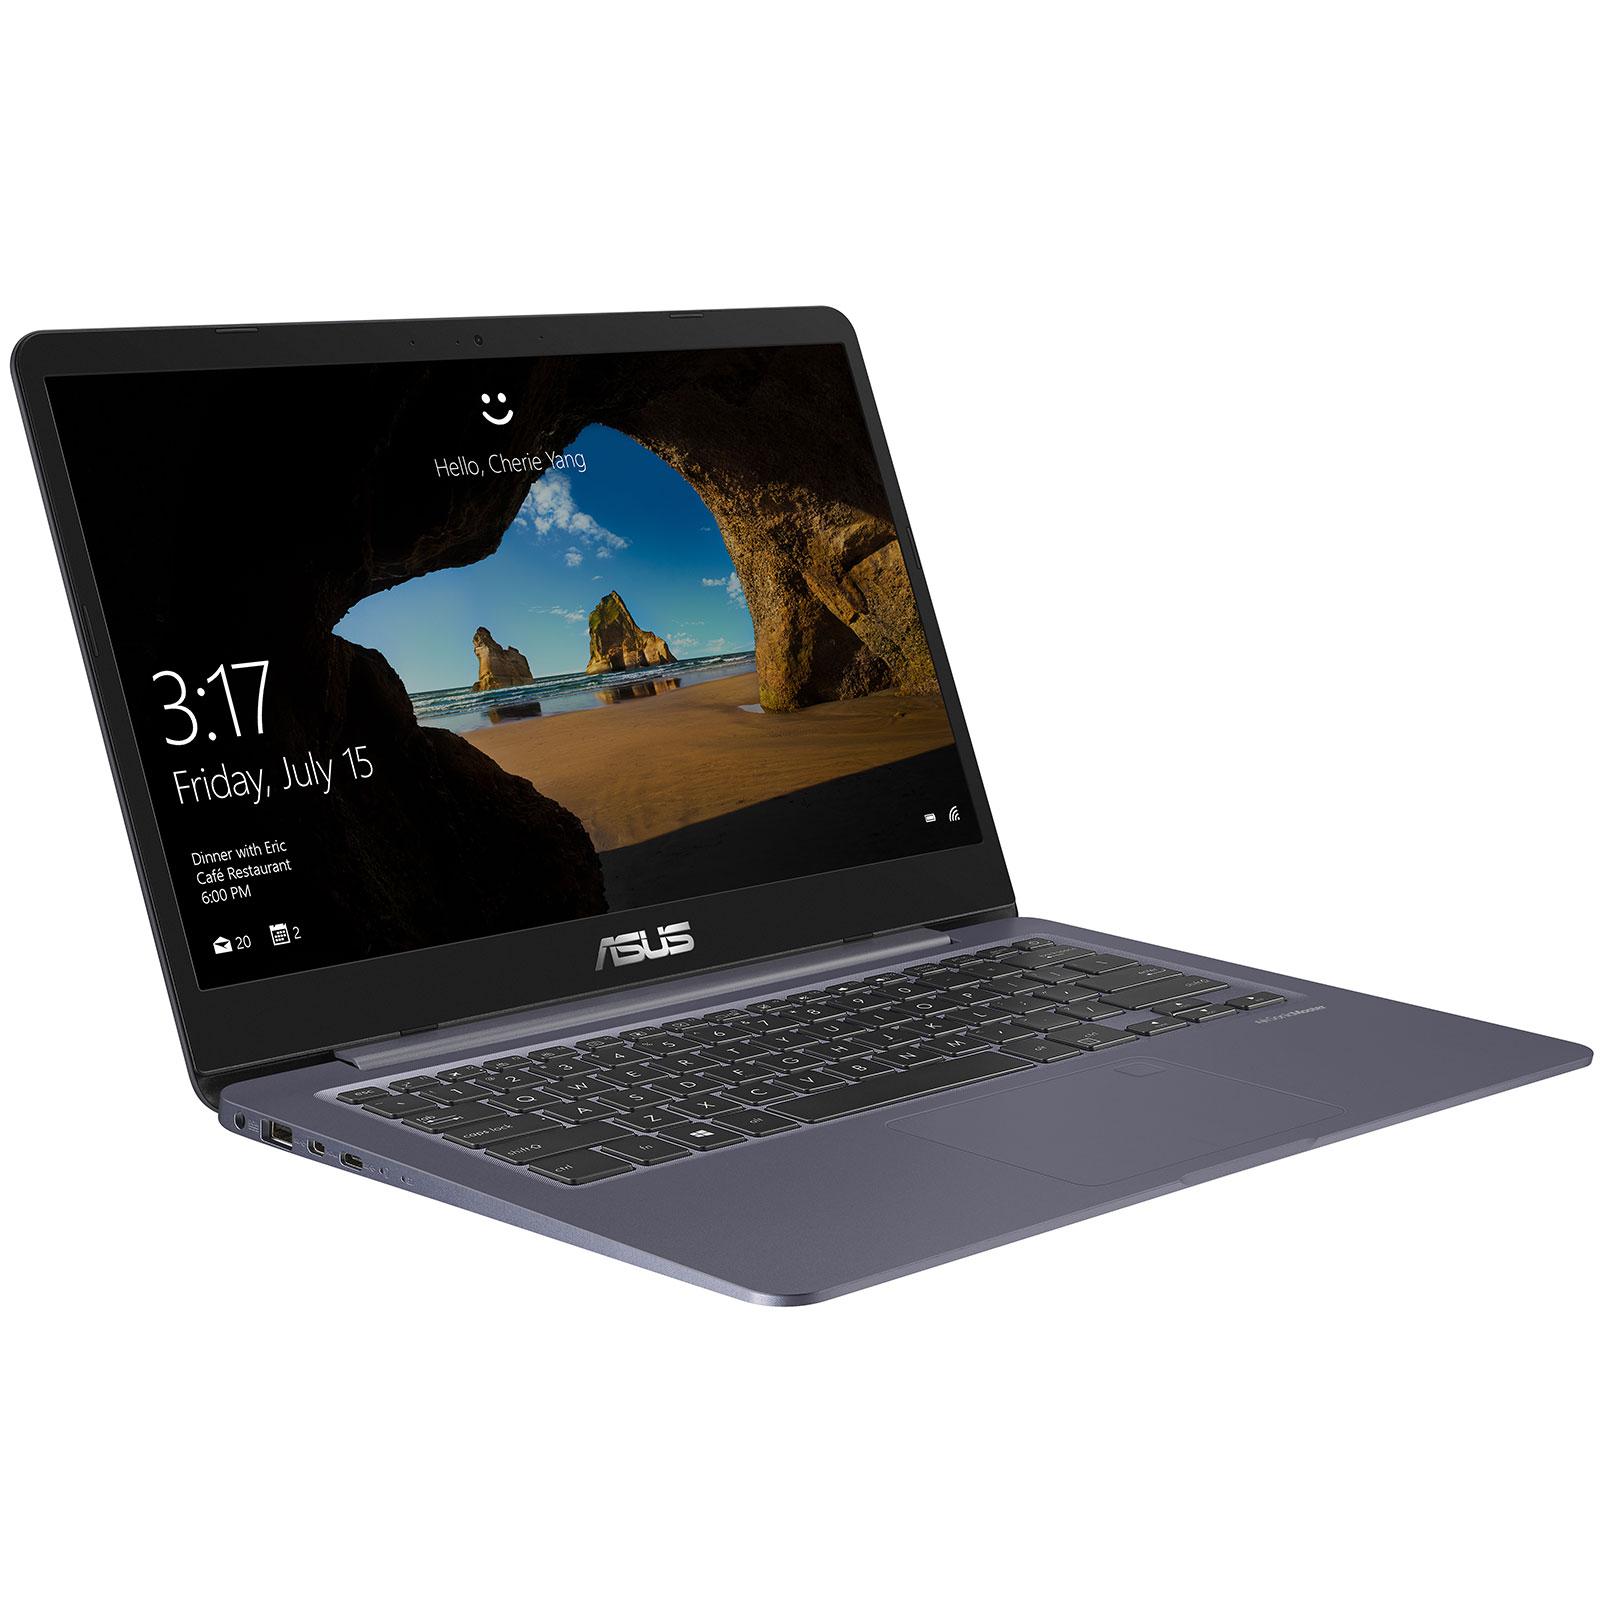 "PC portable ASUS Vivobook S14 S406UA-BM176T Intel Core i5-8250U 8 Go SSD 256 Go 14"" LED Full HD Wi-Fi AC/Bluetooth Webcam Windows 10 Famille 64 bits (garantie constructeur 2 ans)"